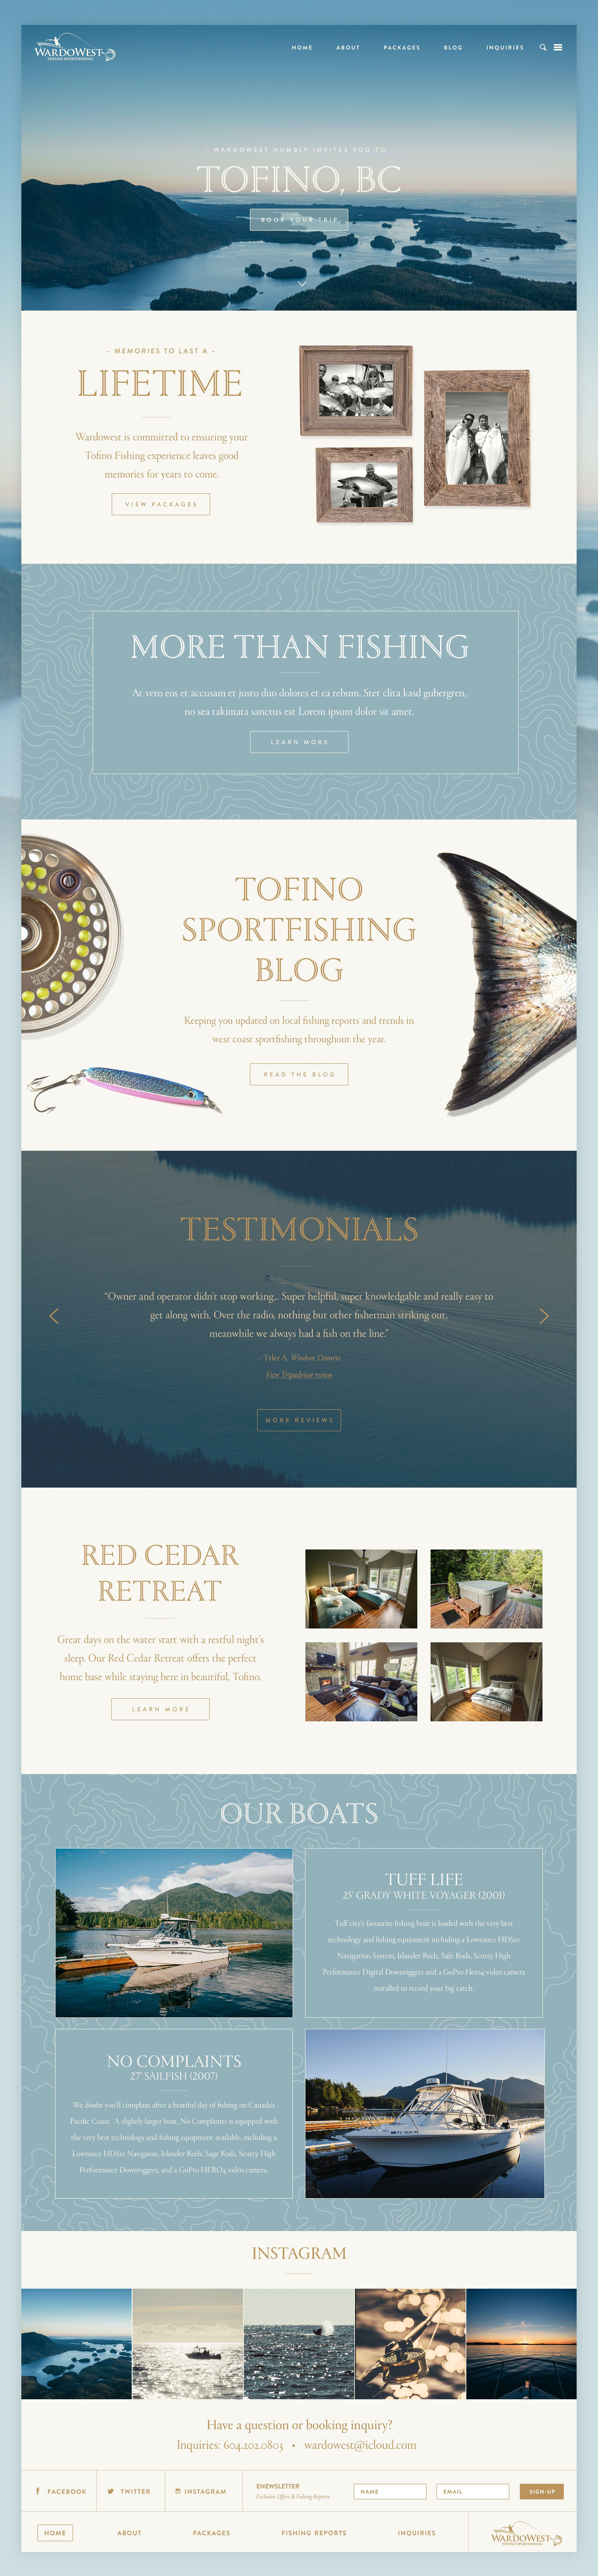 Wardowest full retina panels web design blue light blue navy fishing classic traditional responsive fly masculine website